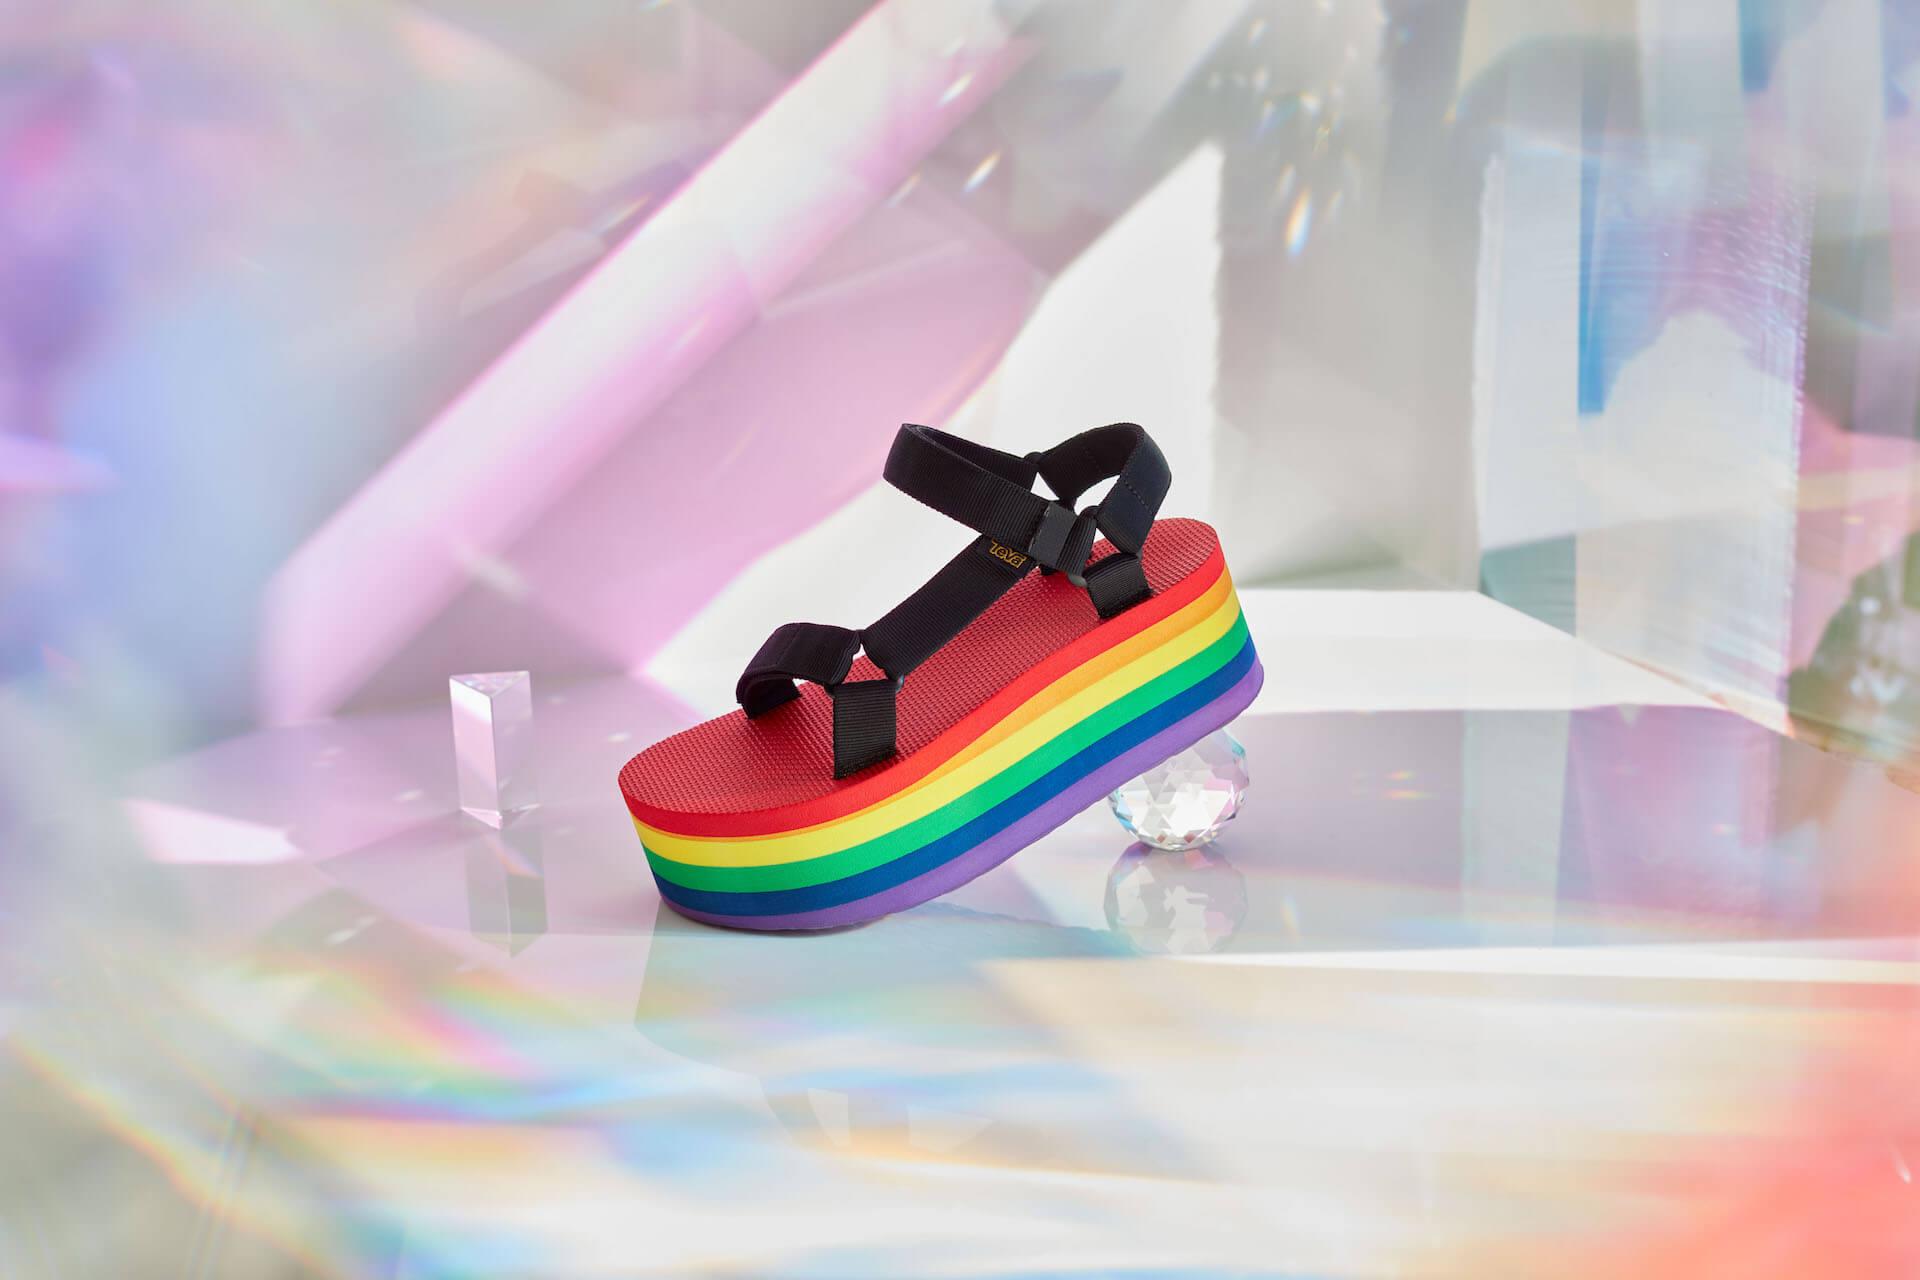 Tevaから、LGBTQ+支援団体「It Gets Better Project」記念サンダル登場!レインボーカラーの2種類 lf200421_teva_universal_05